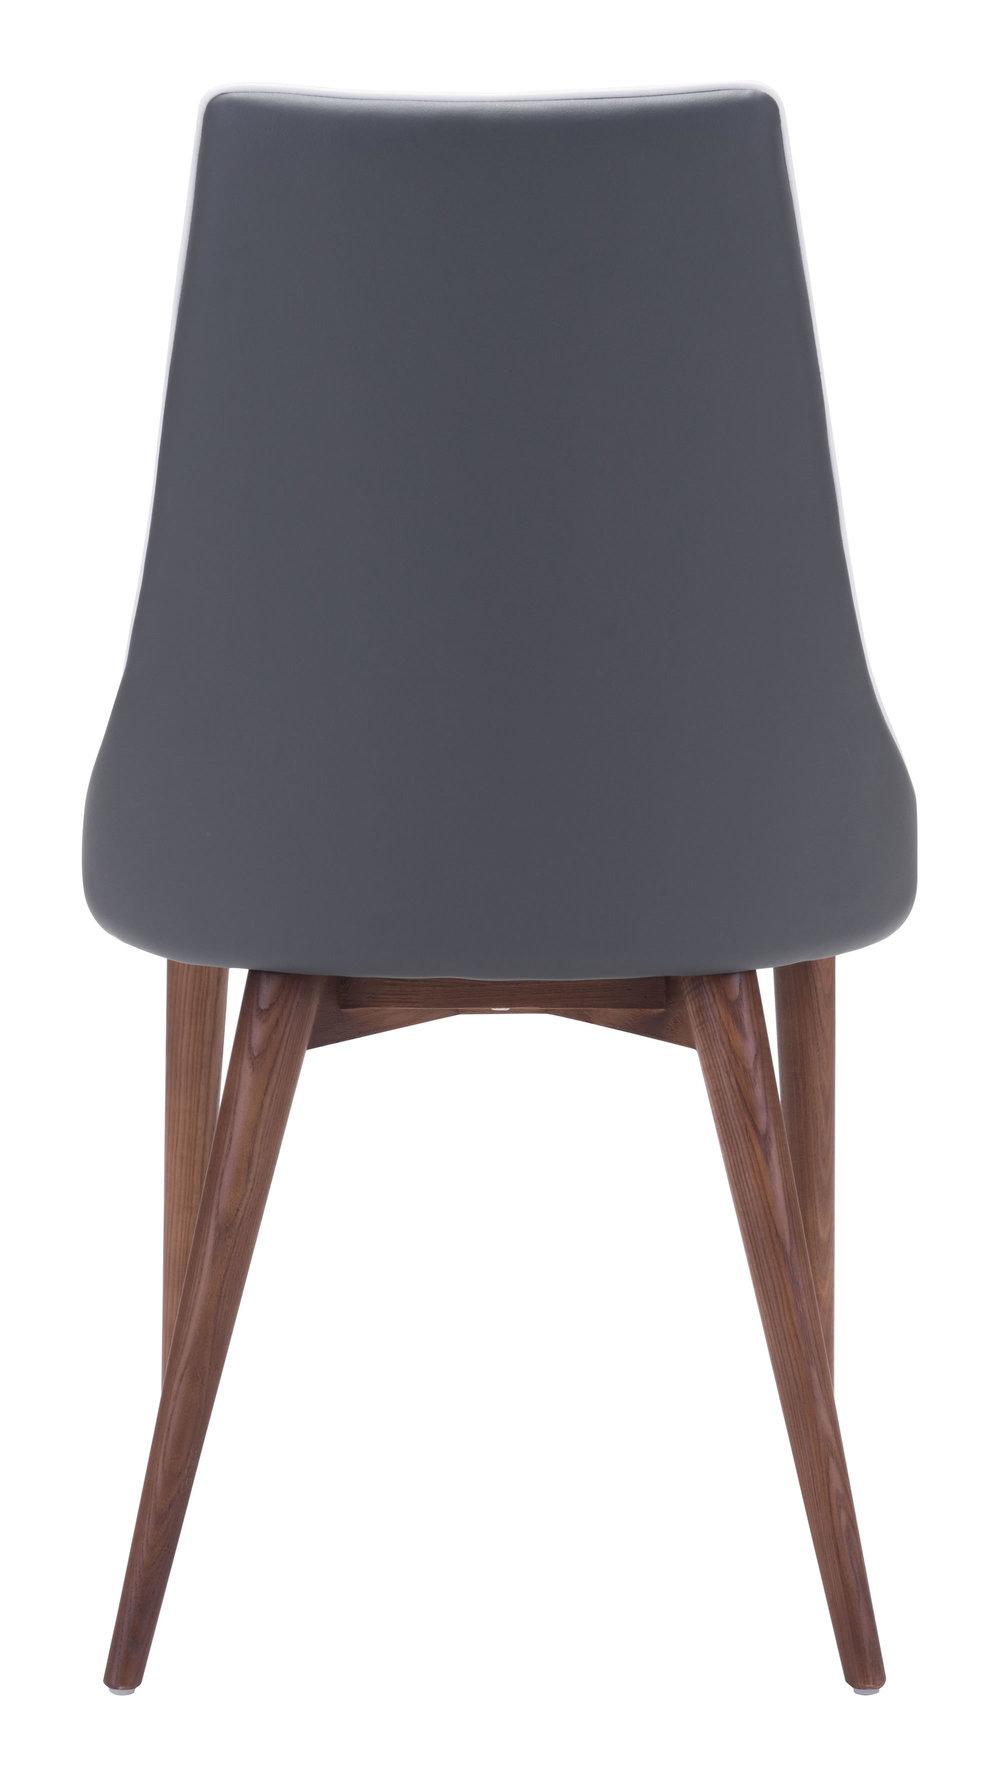 Zuo Modern Contemporary - Moor Dining Chair - Set of 2 - Dark Gray